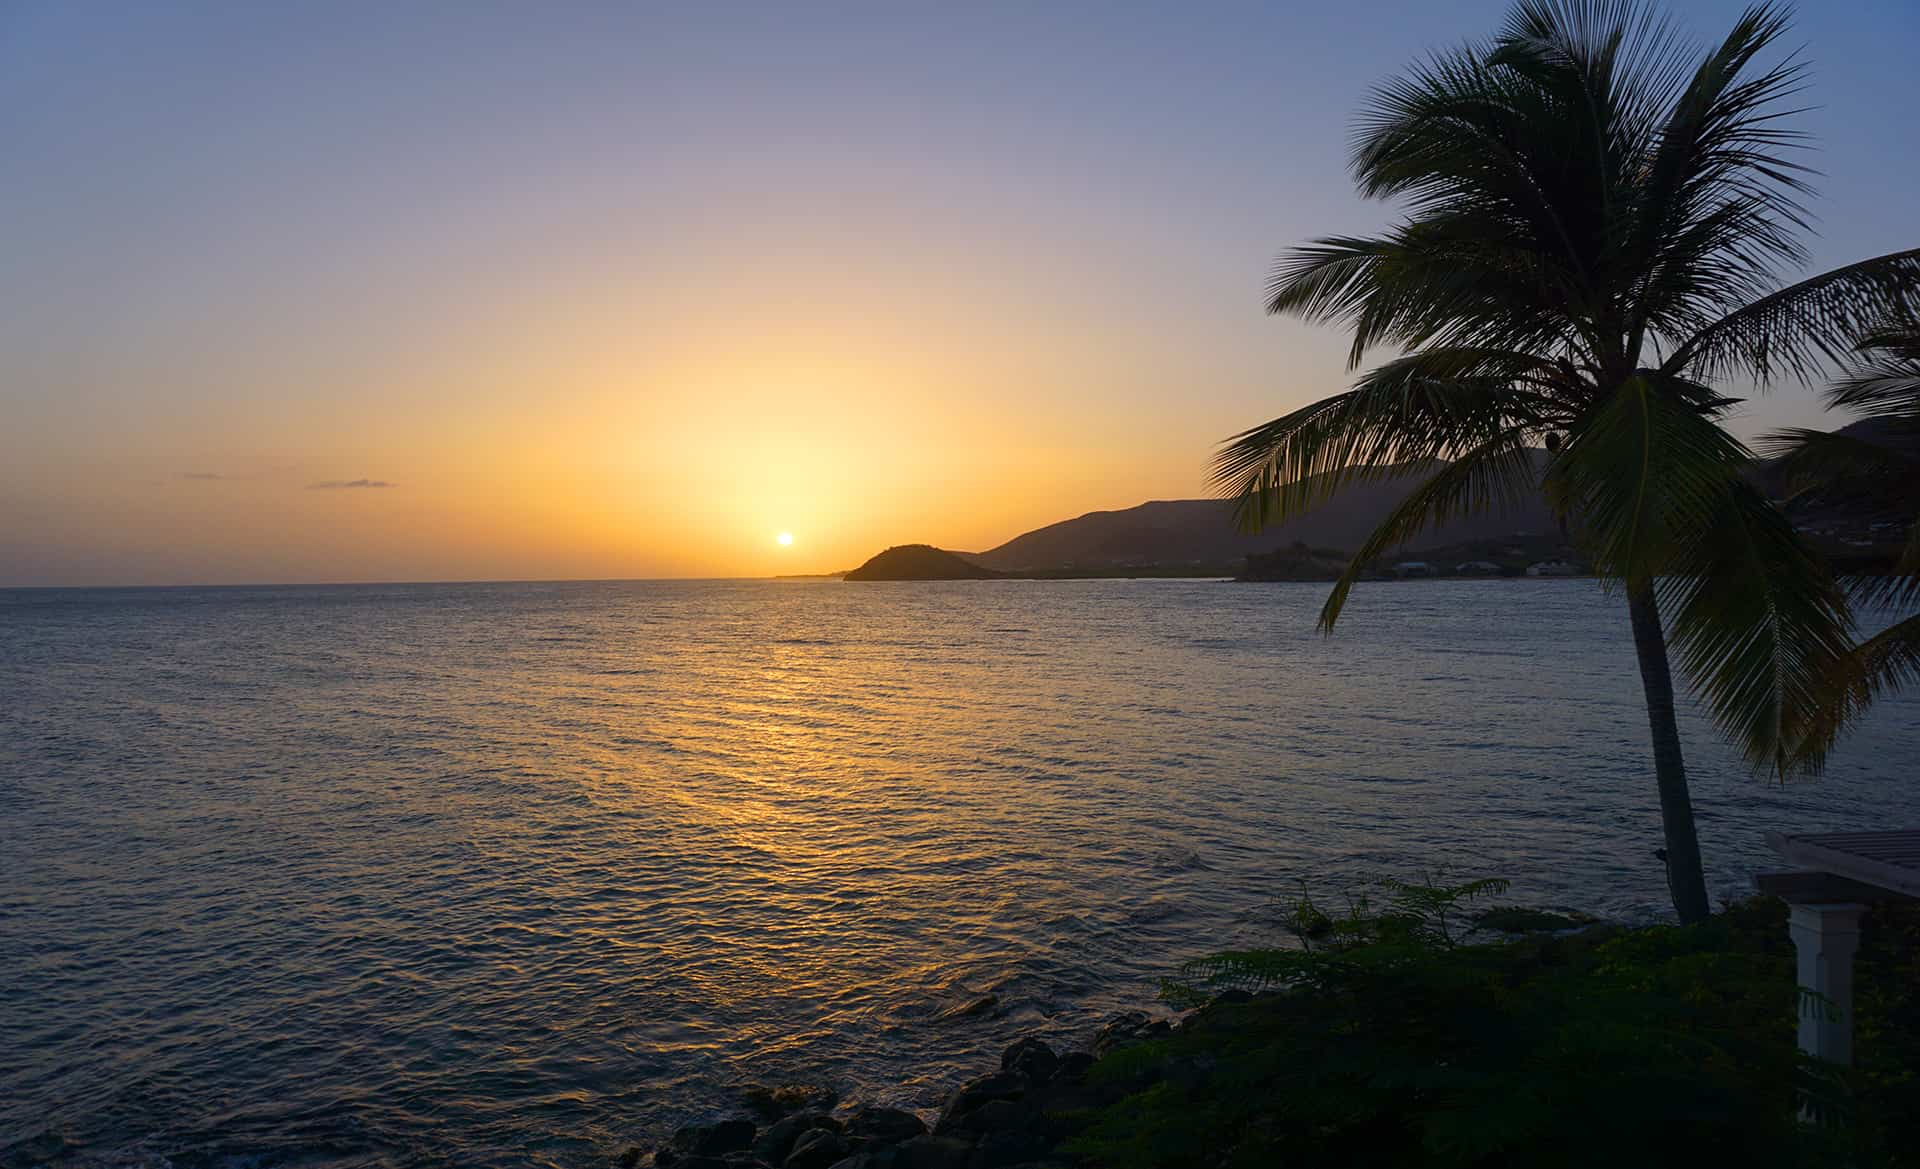 Sunset at Antigua and Barbuda